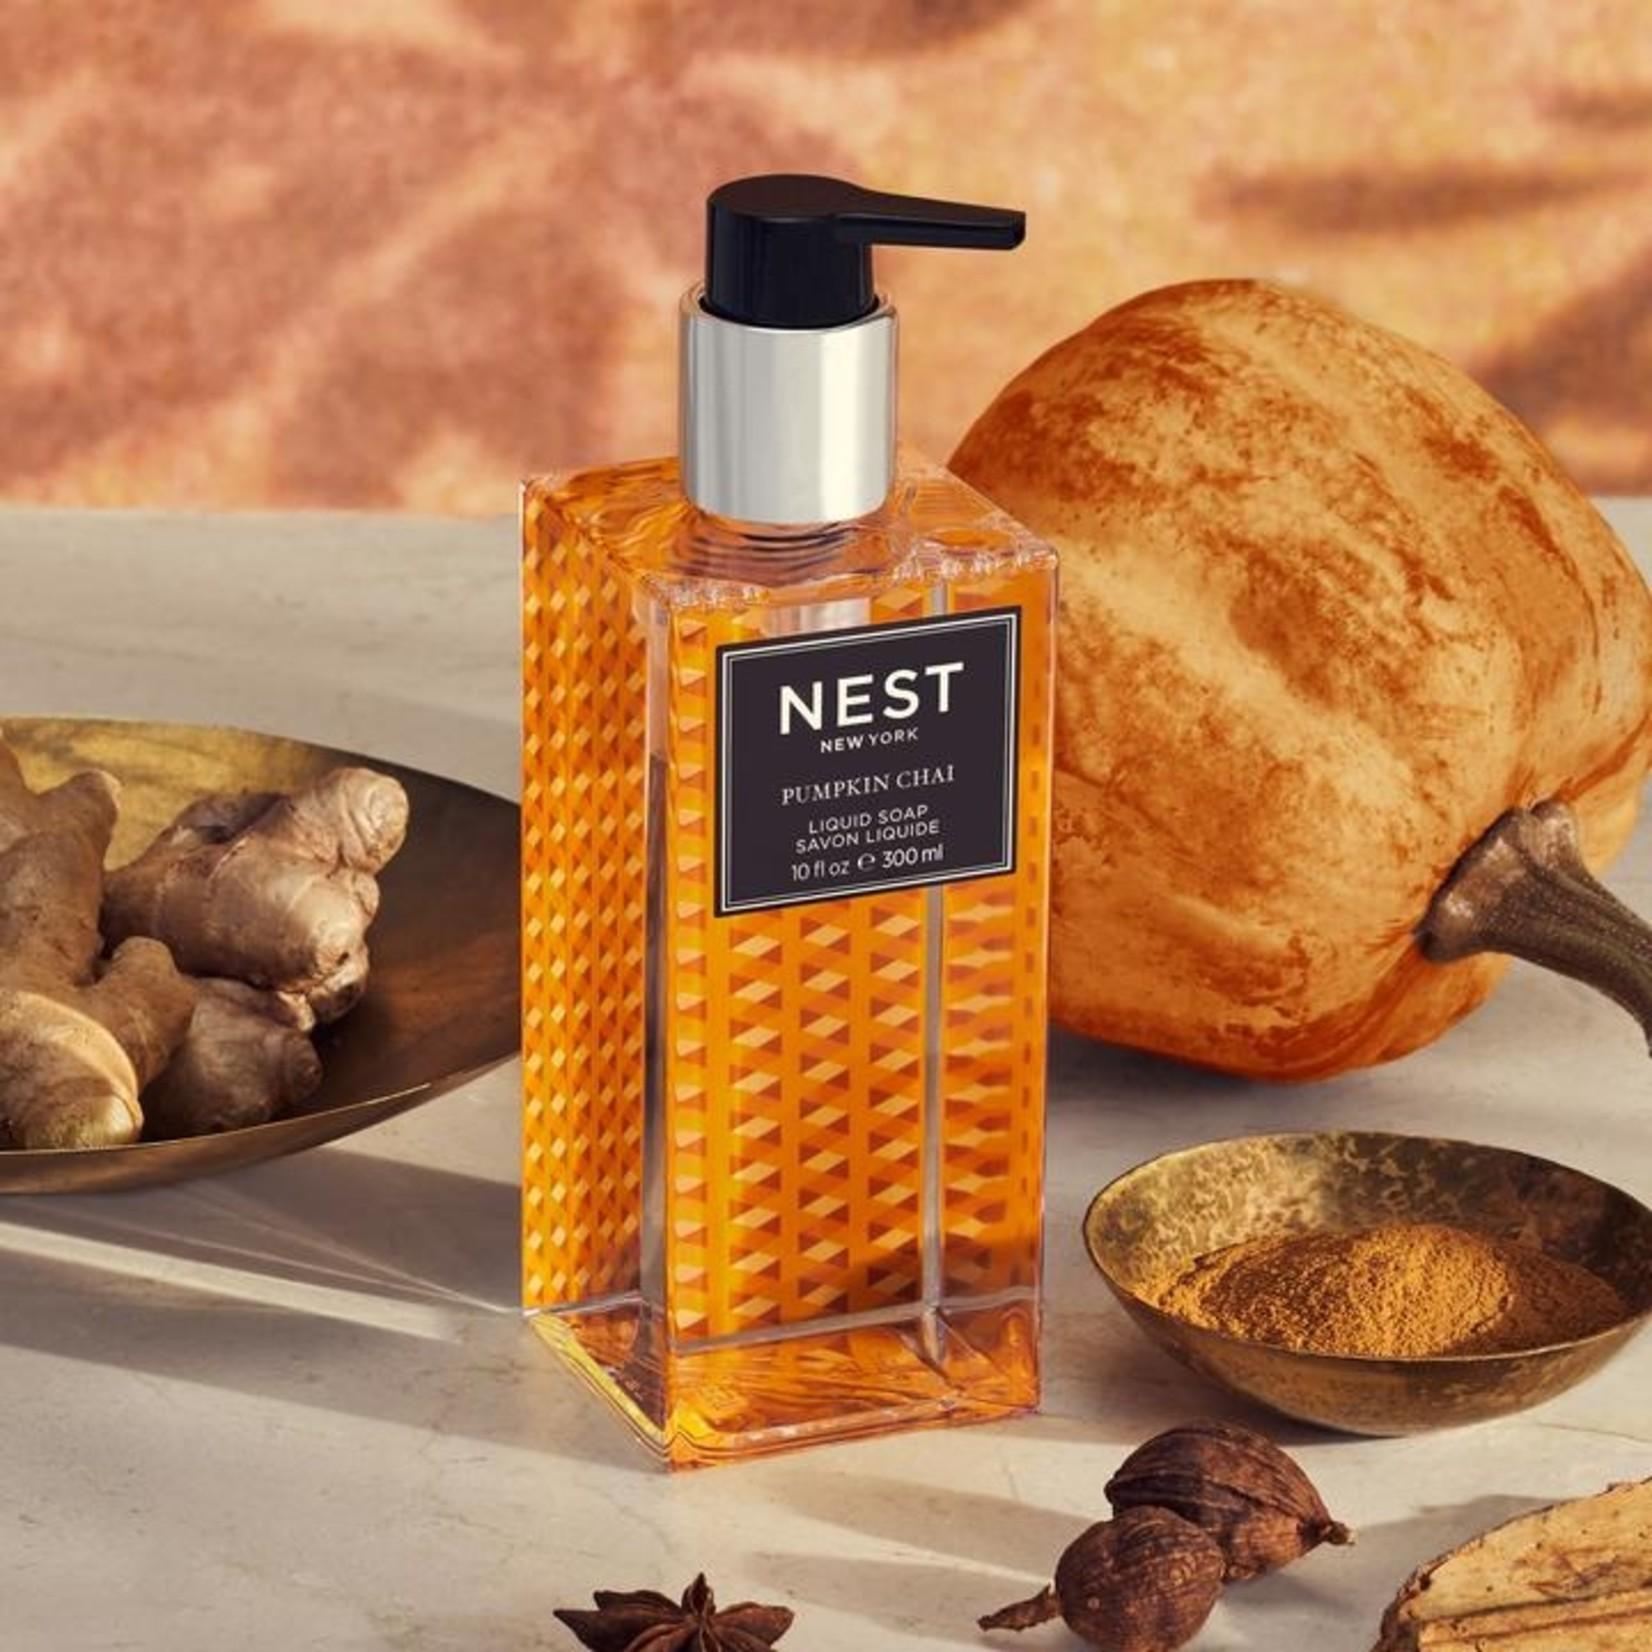 NEST NEW YORK Pumpkin Chai Liquid Soap